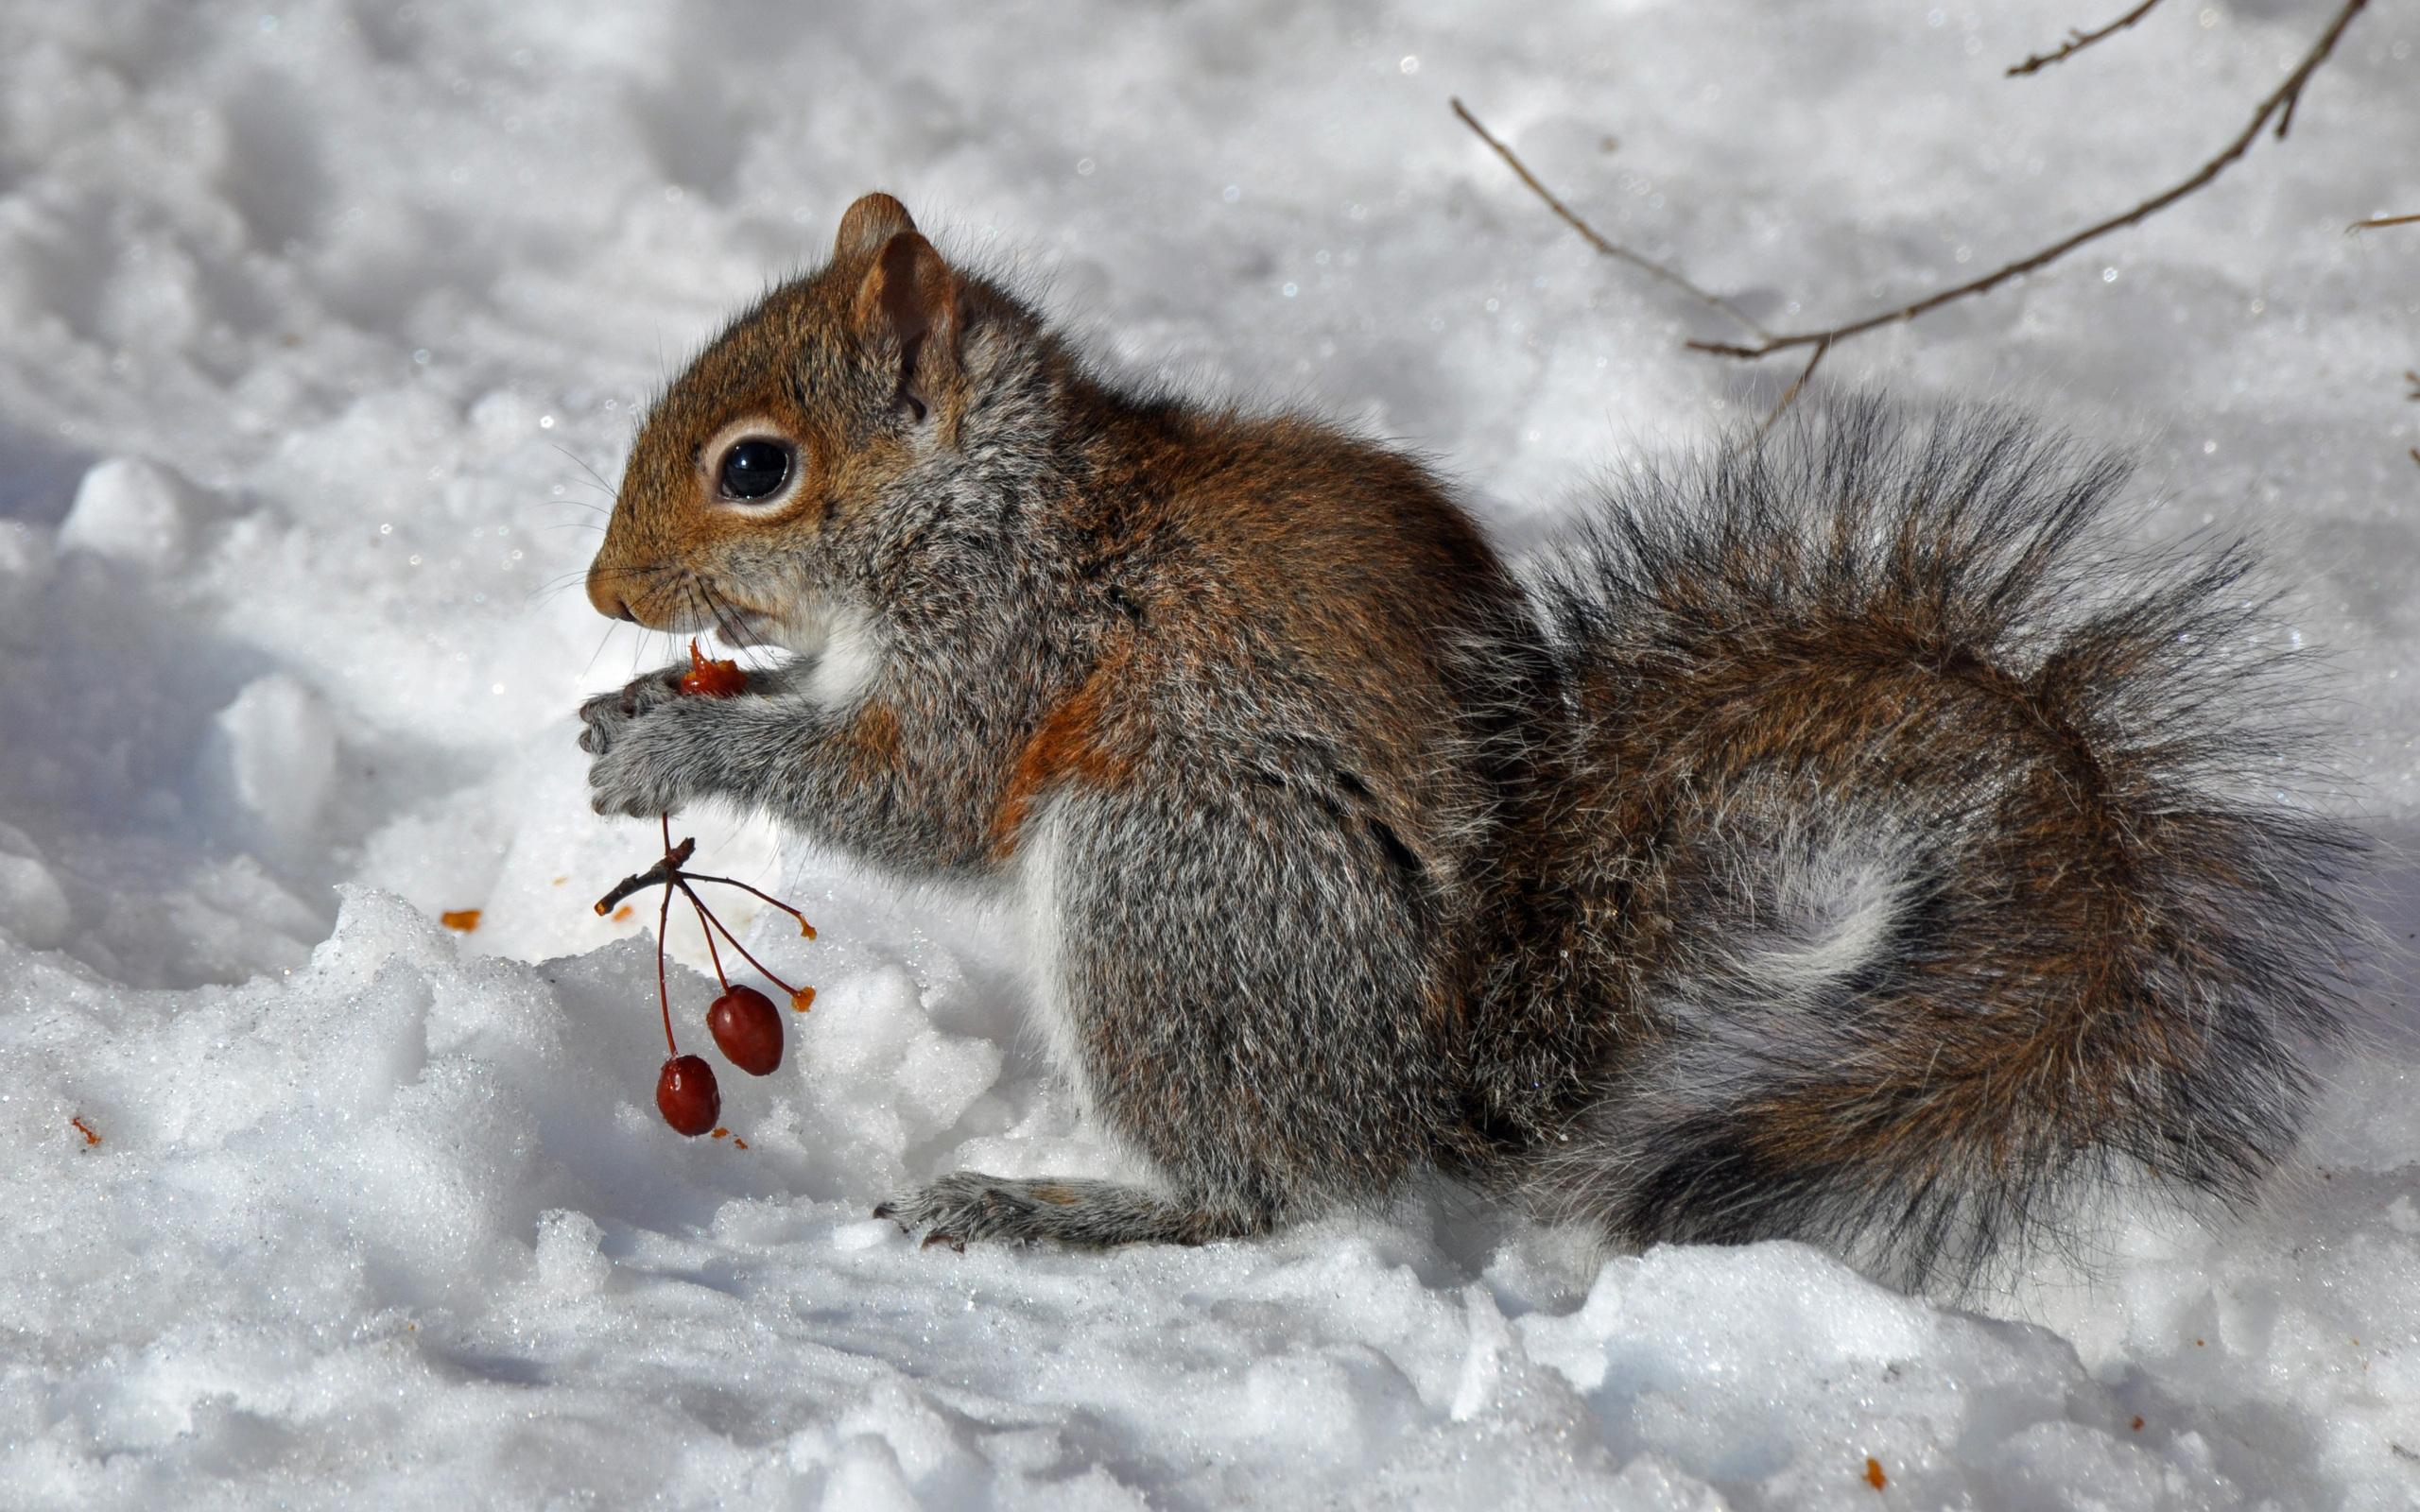 Squirrel appreciation day 8 facts about squirrels the for Foto inverno per desktop